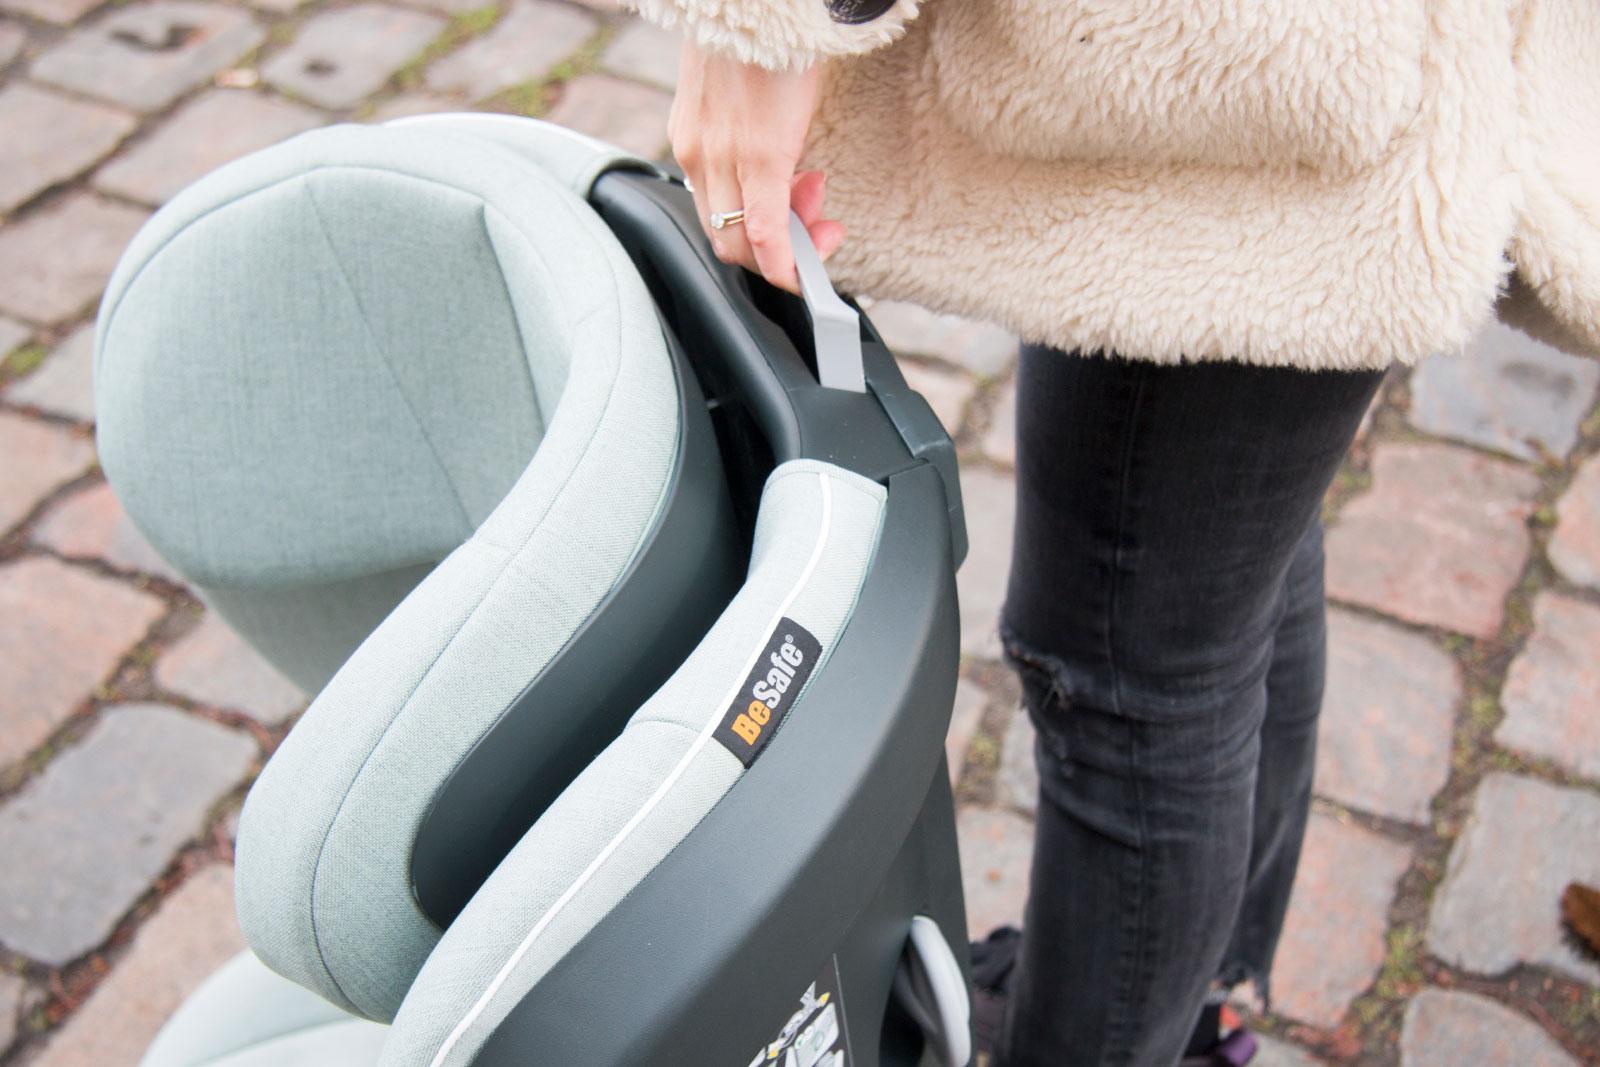 besafe_flex_fix_car_seat_safety04